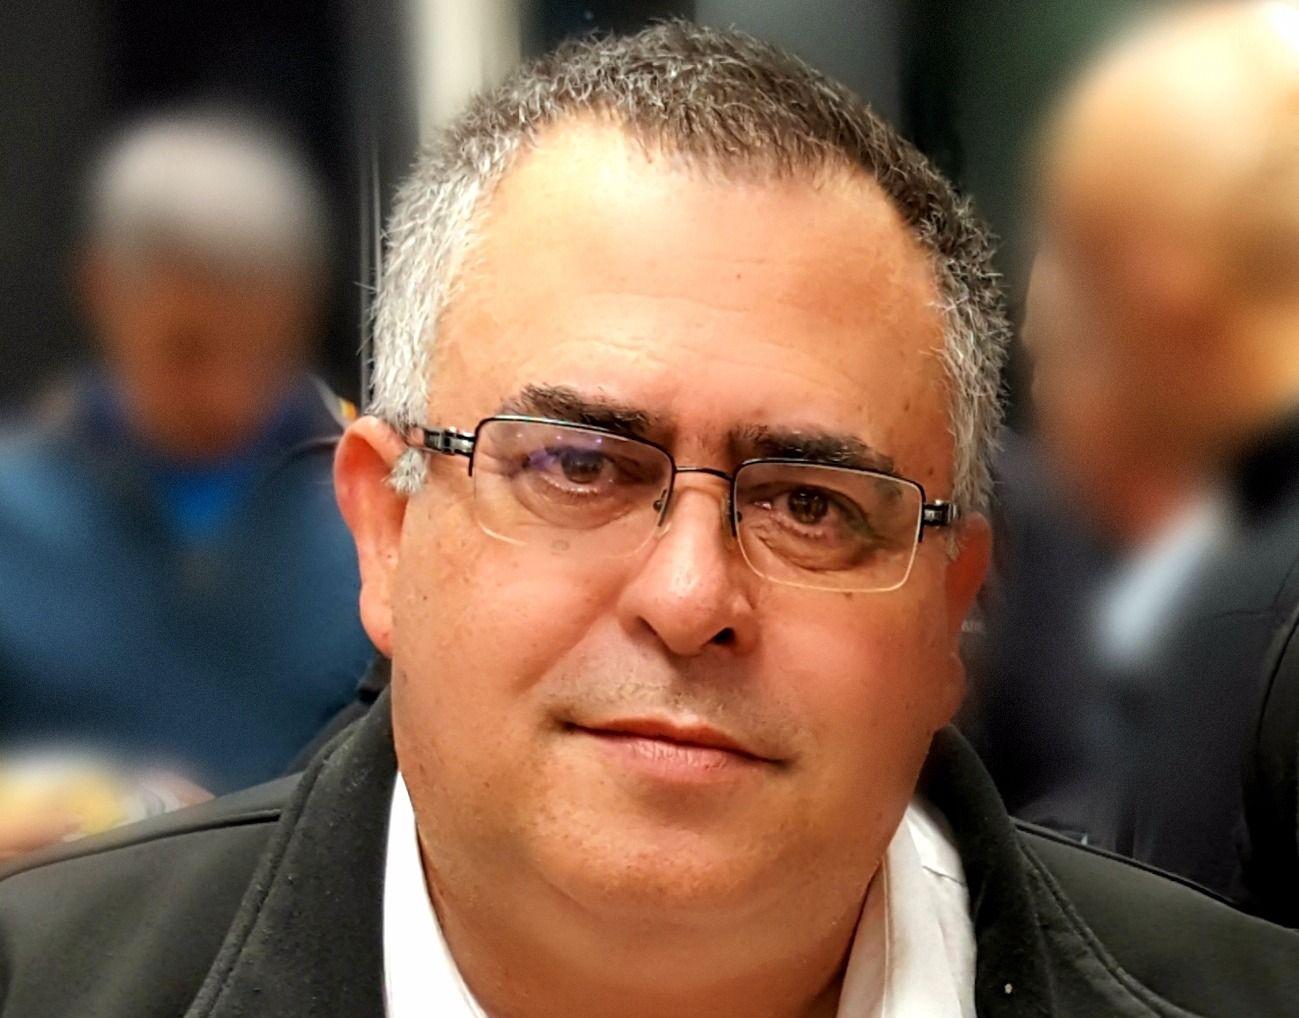 Likud politician David Bitan.